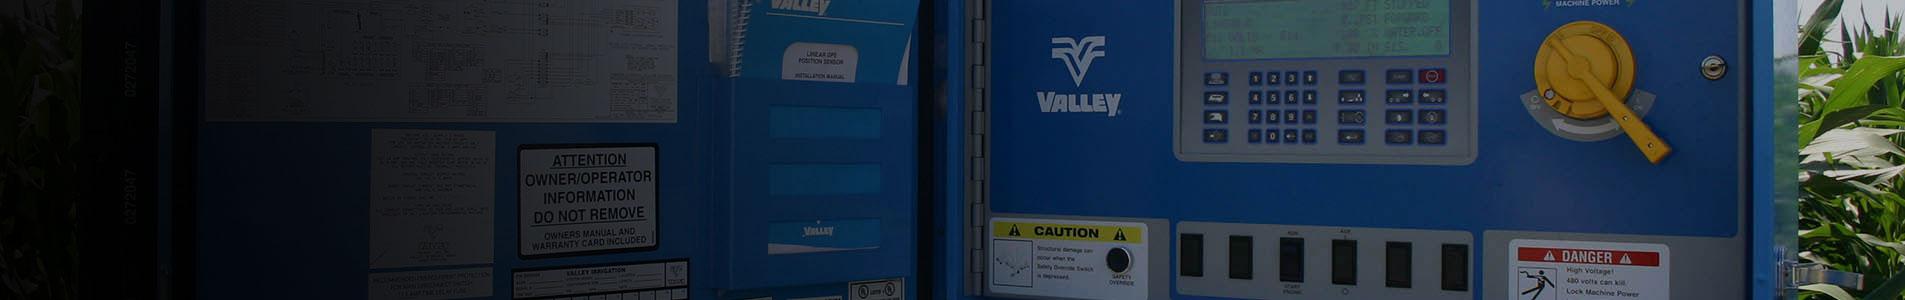 valley autopilot linear control panel - irrigation control panel solution